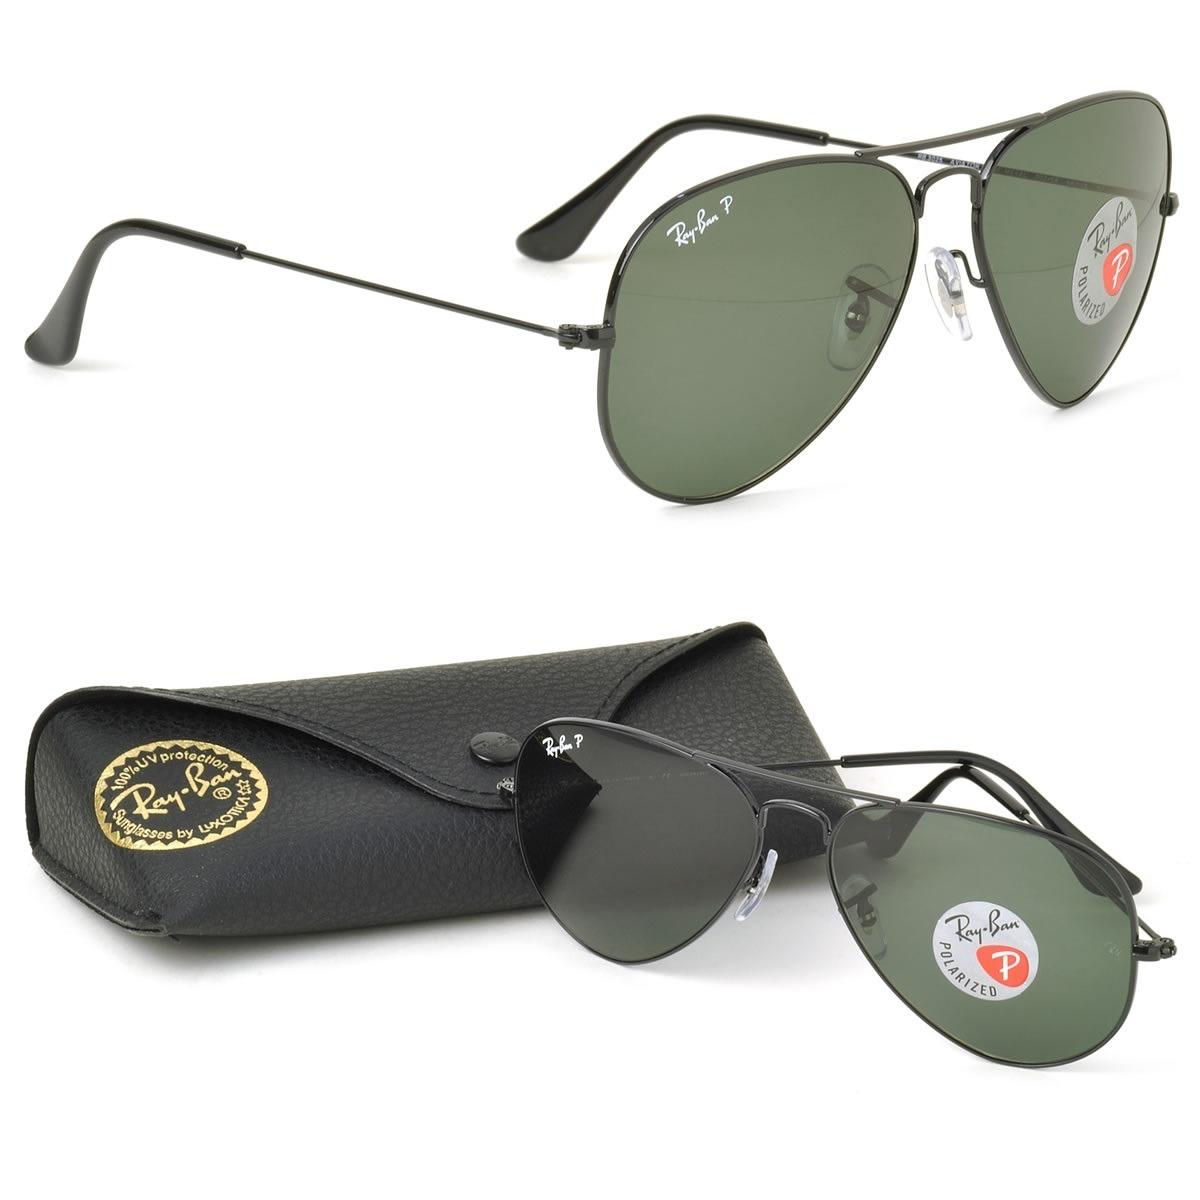 cc128db22 óculos ray ban rb3025 aviador polarizado de safira original. Carregando zoom .